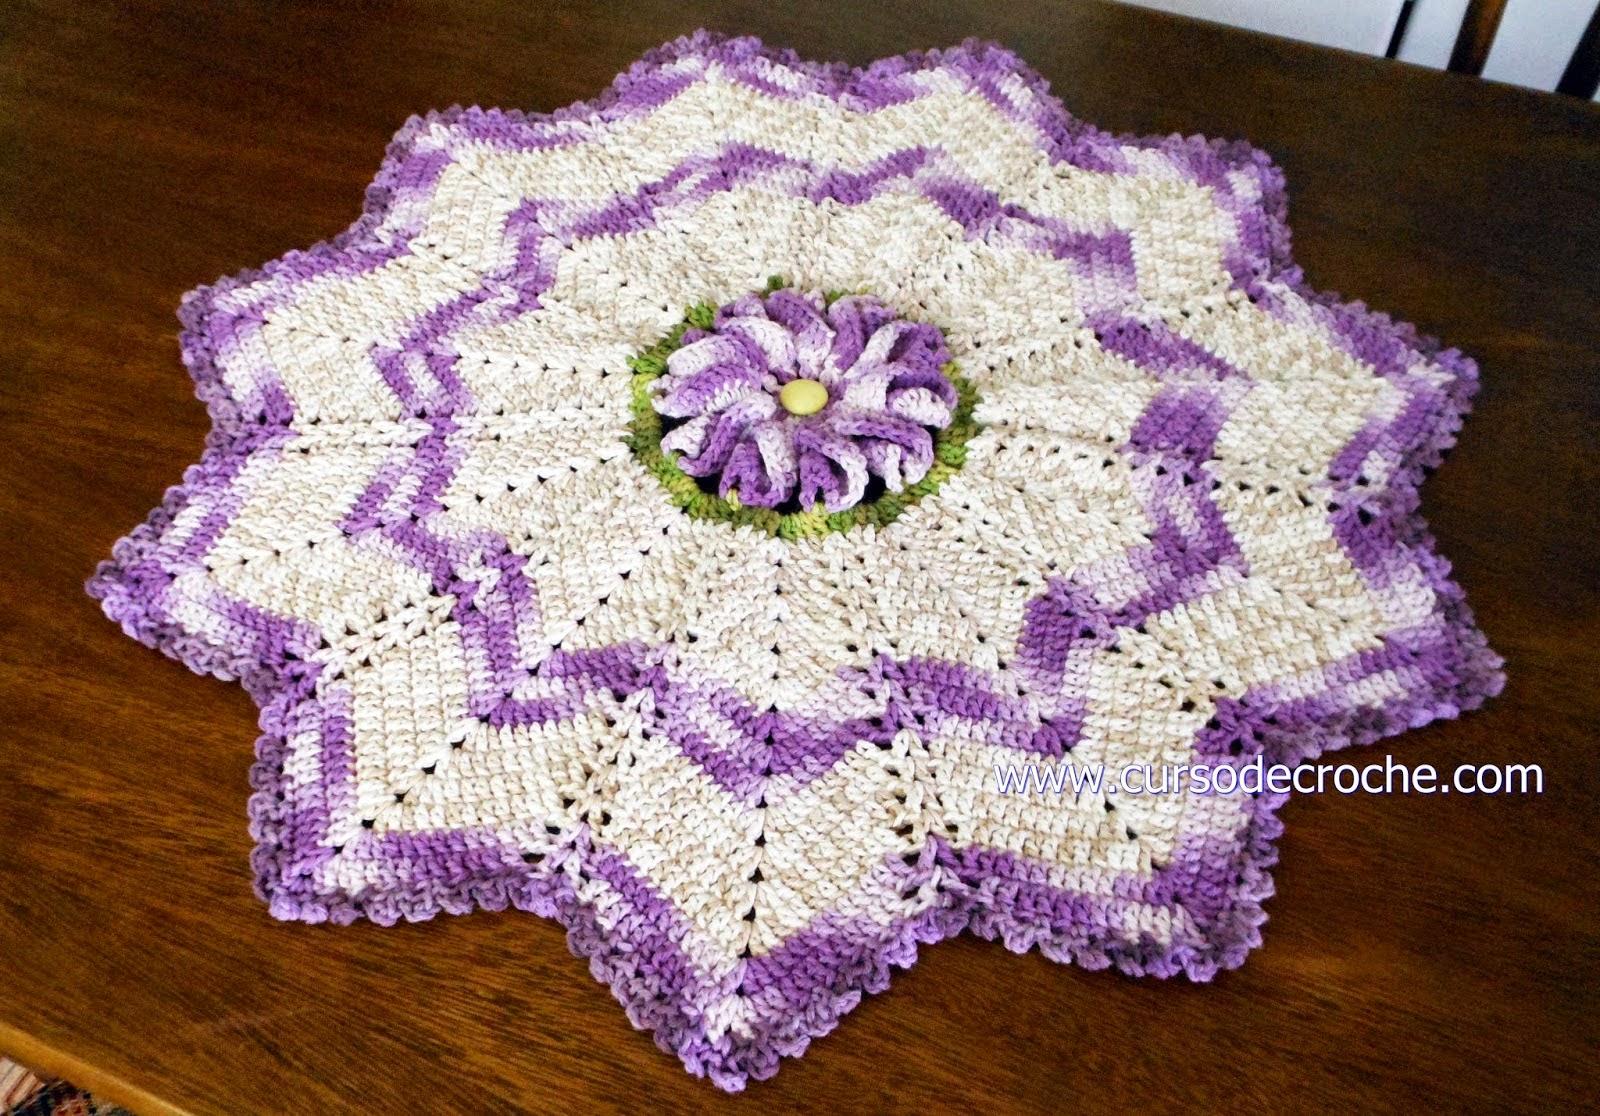 aprender croche tapetes flores multicolor lilás dvd video-aulas loja curso de croche frete gratis edinir-croche